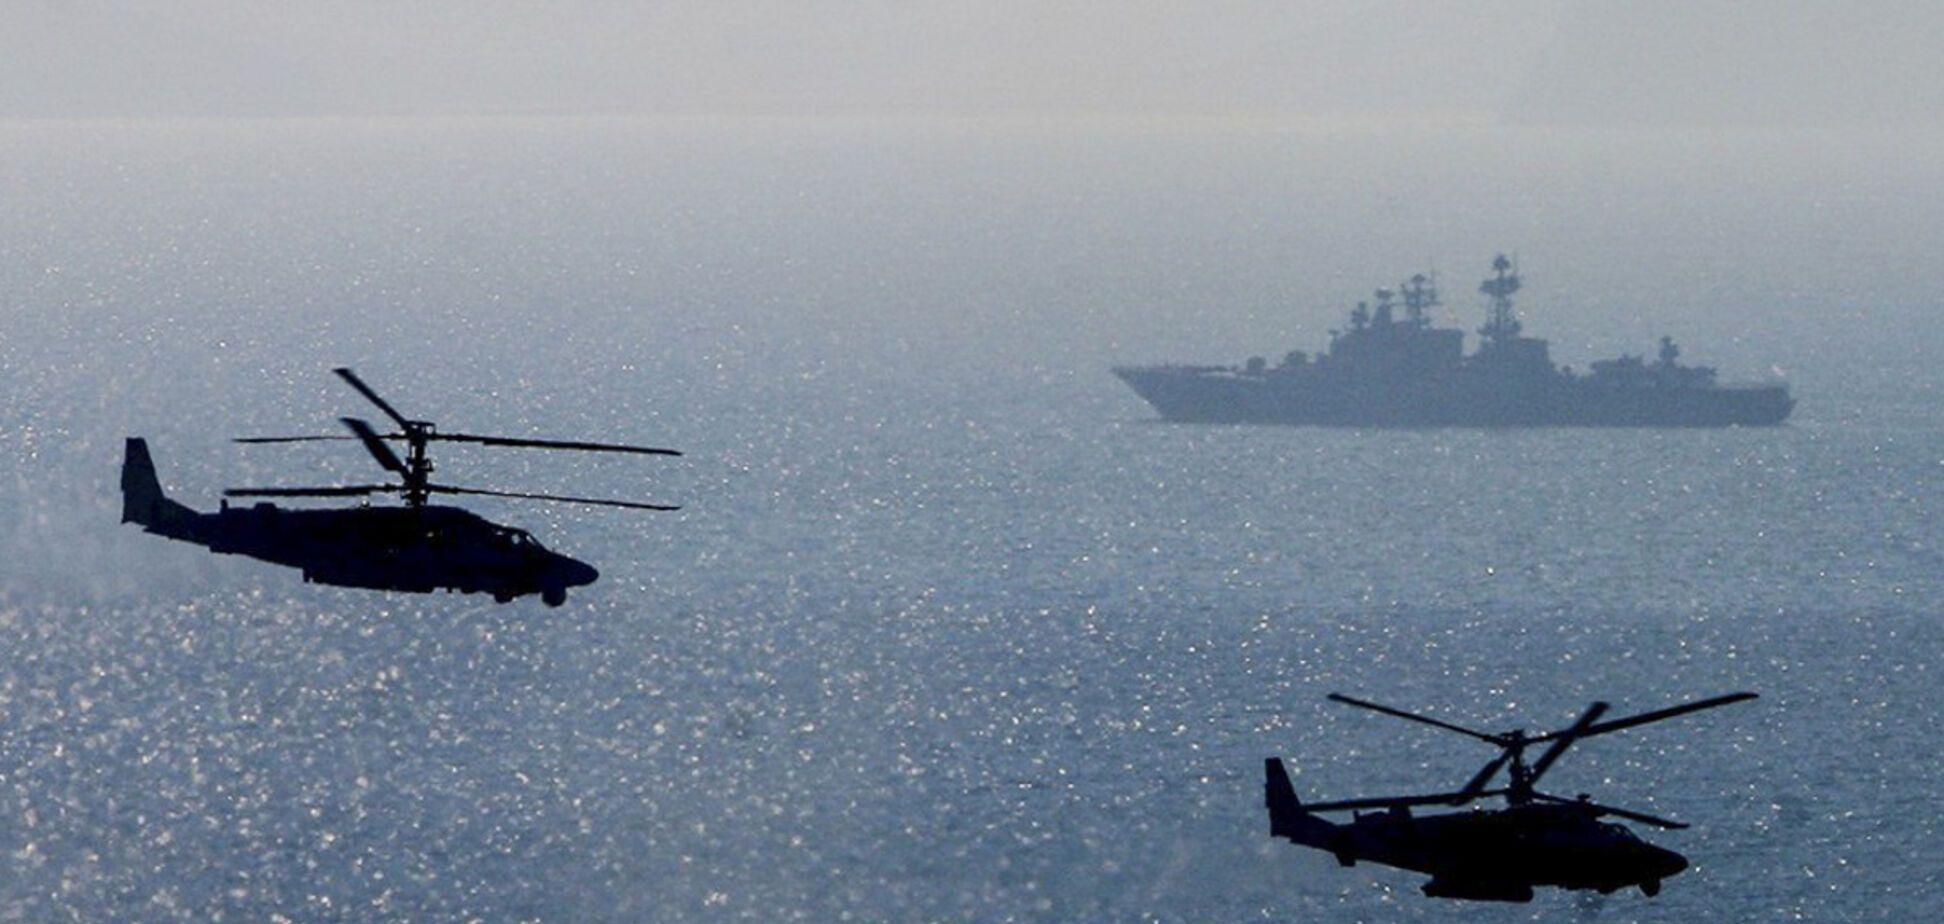 'Корабли иногда тонут': на росТВ Украине пригрозили из-за скандала в Азовском море